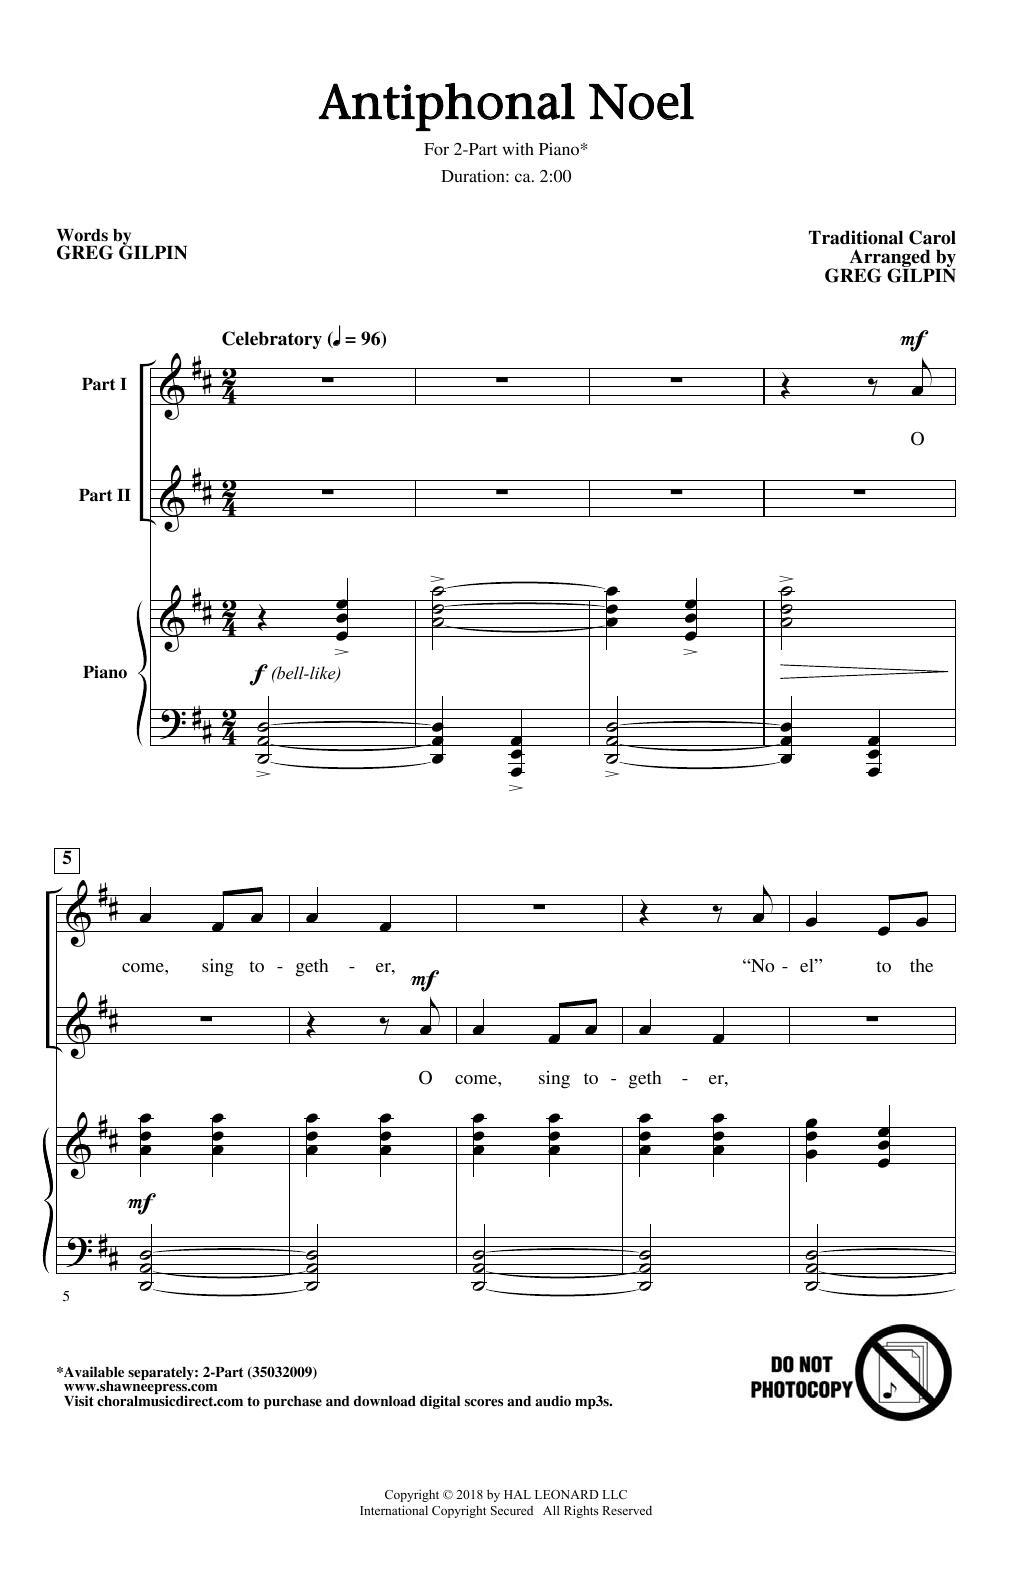 Greg Gilpin Antiphonal Noel sheet music notes and chords